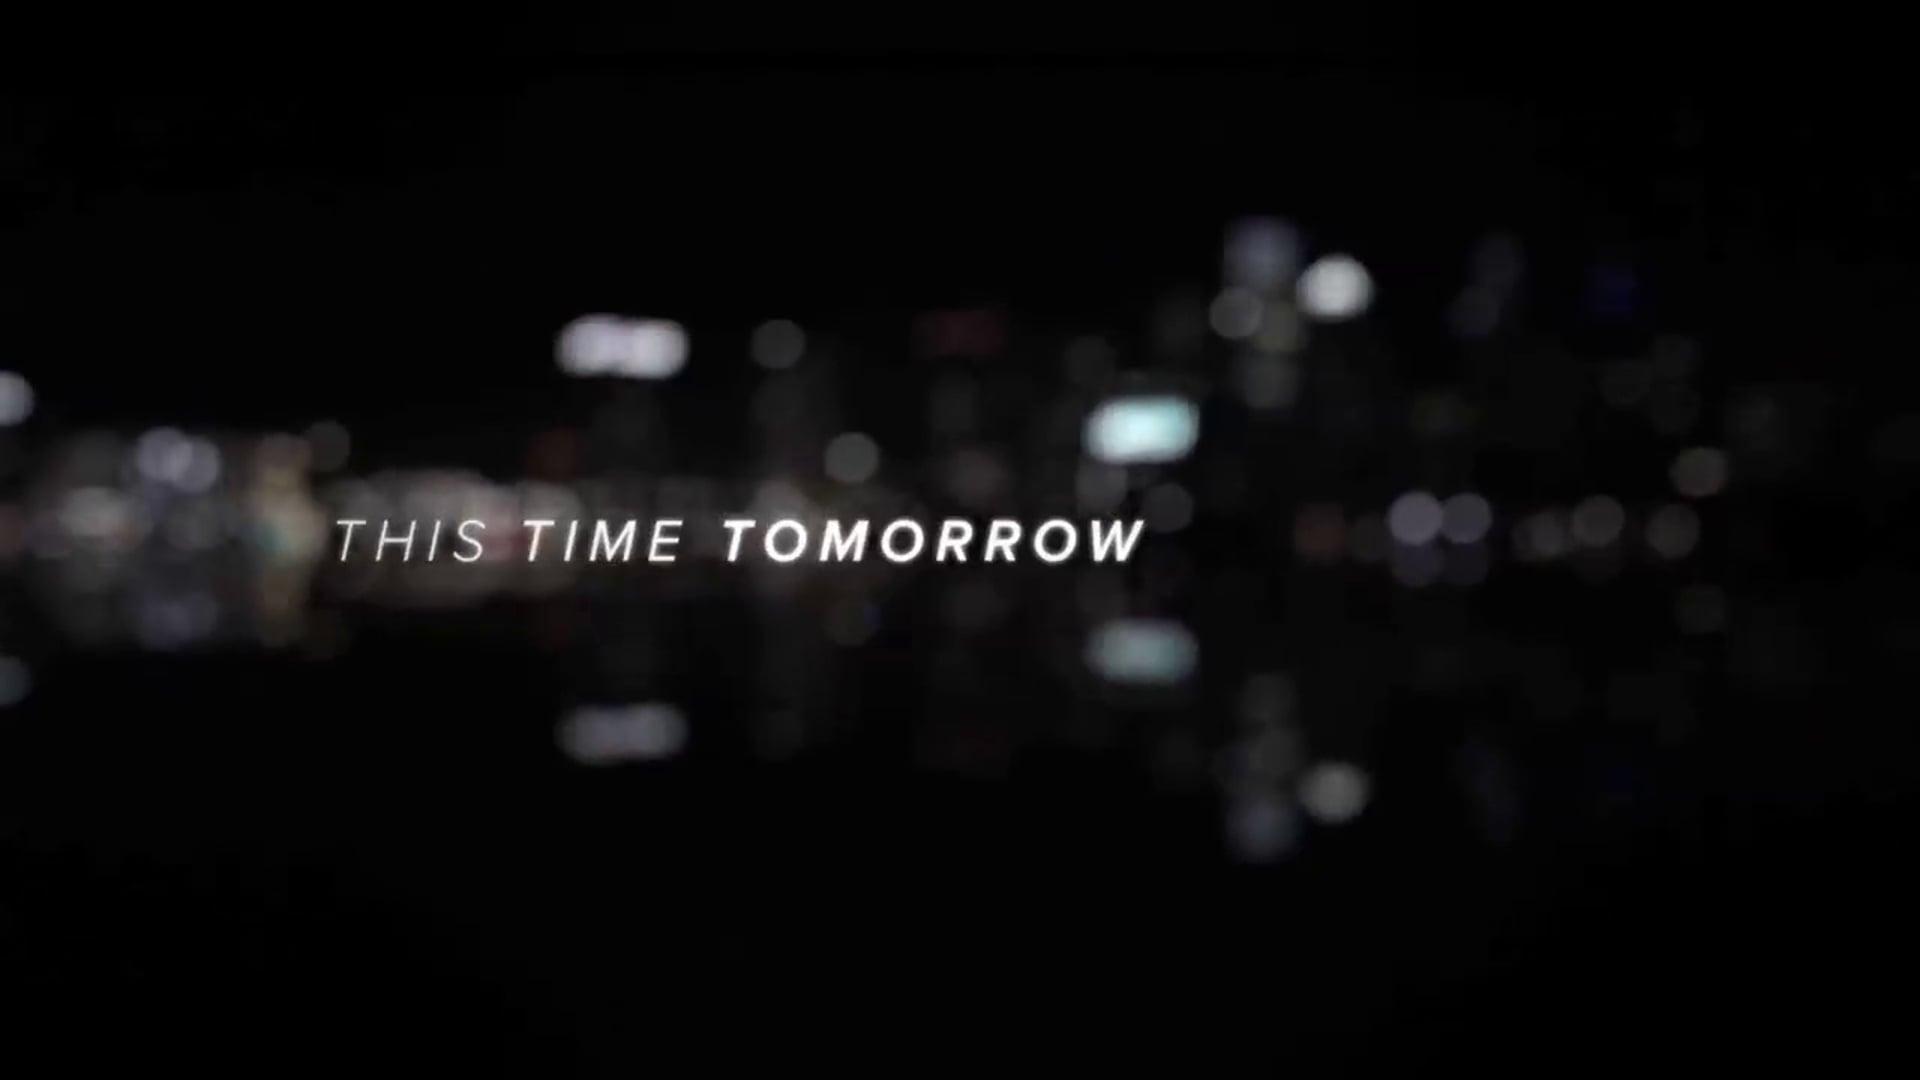 This Time Tomorrow (2012)